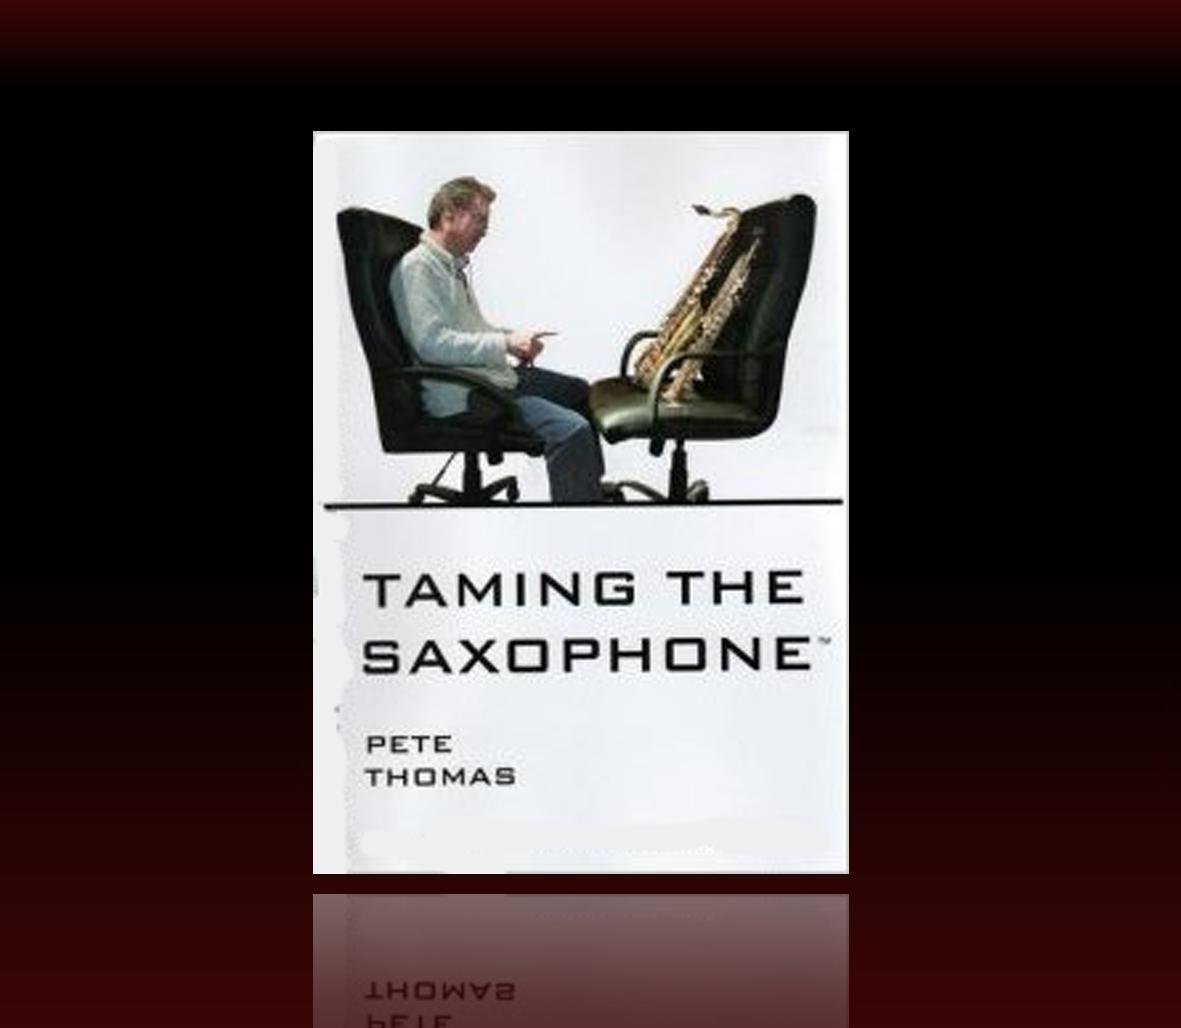 Pete Thomas - Taming The Saxophone